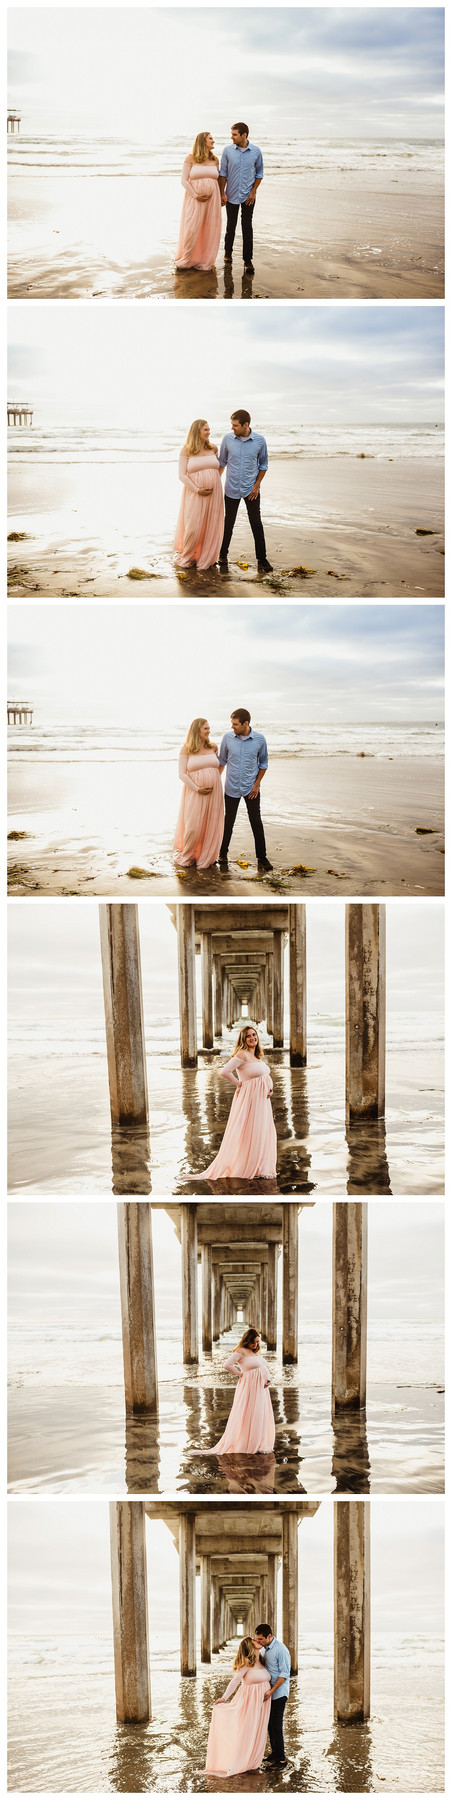 San Diego Beach Maternity Session / Olga Kubrak Photography